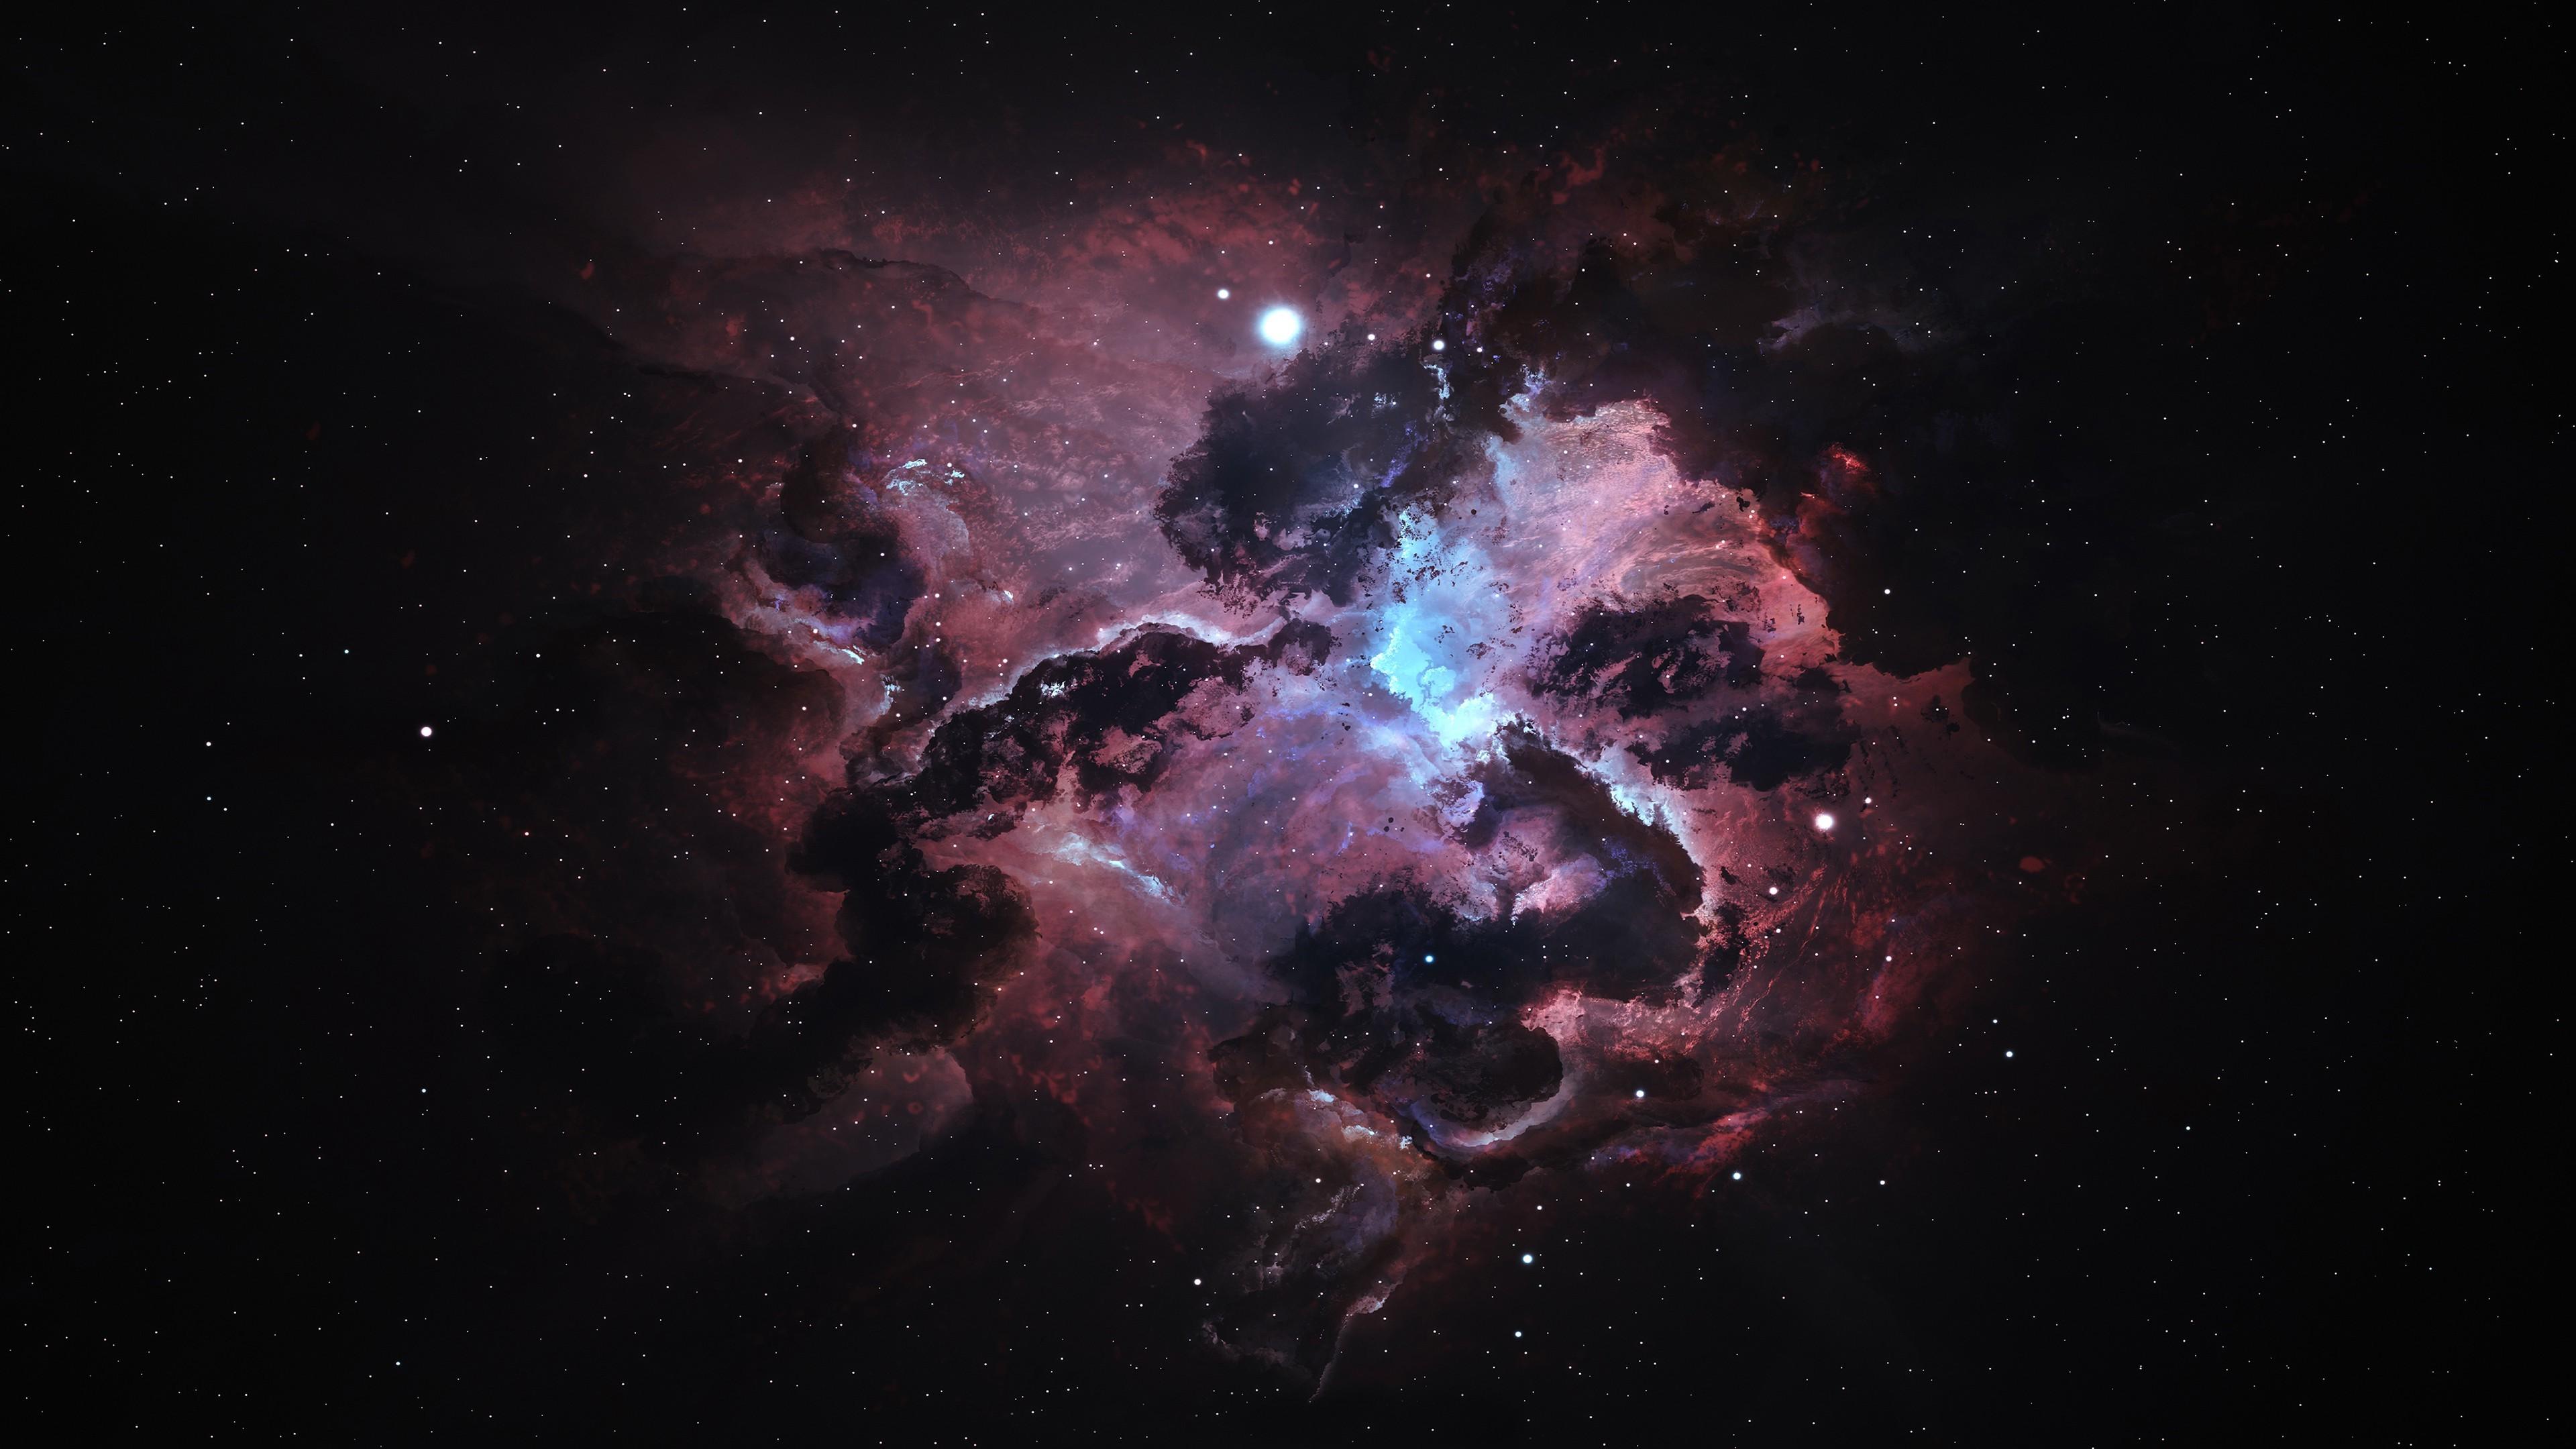 3840x2160 Px Artwork Digital Art Galaxy Nebula Space Stars